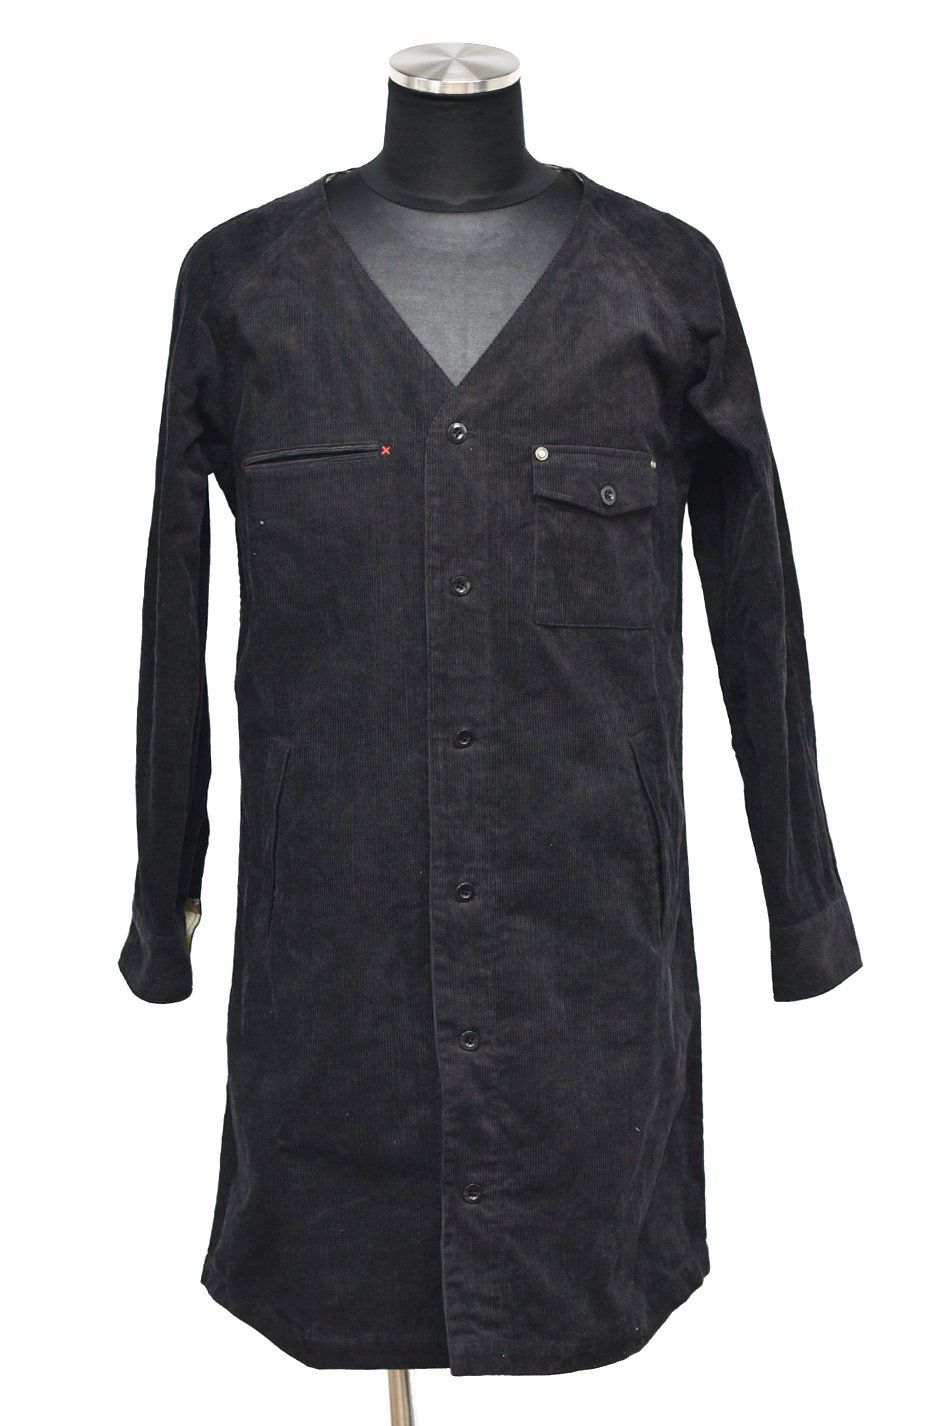 BURNOUT(バーンアウト )コーデュロイ ロングカーゴシャツ